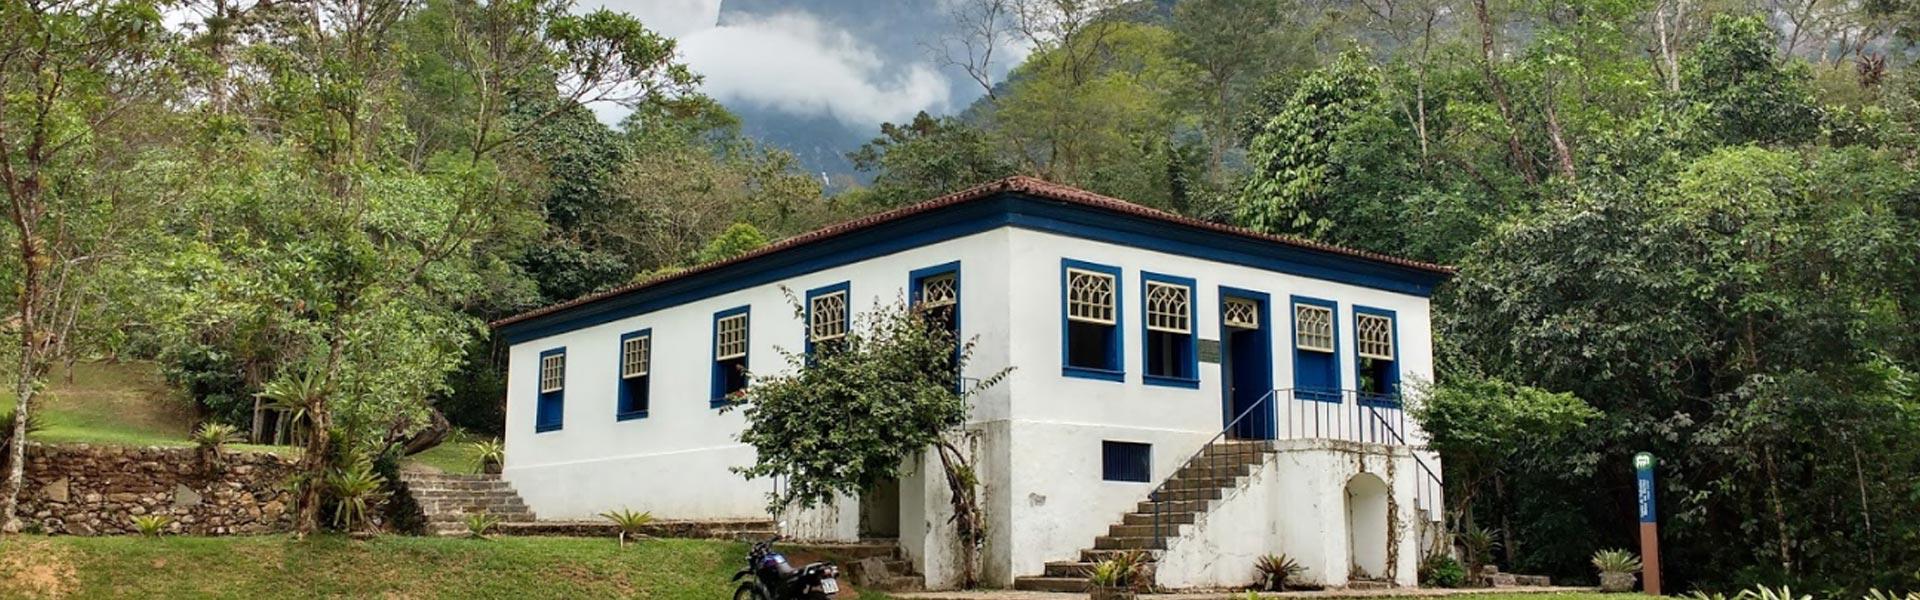 parque-nacional-da-serra-dos-orgaos-04